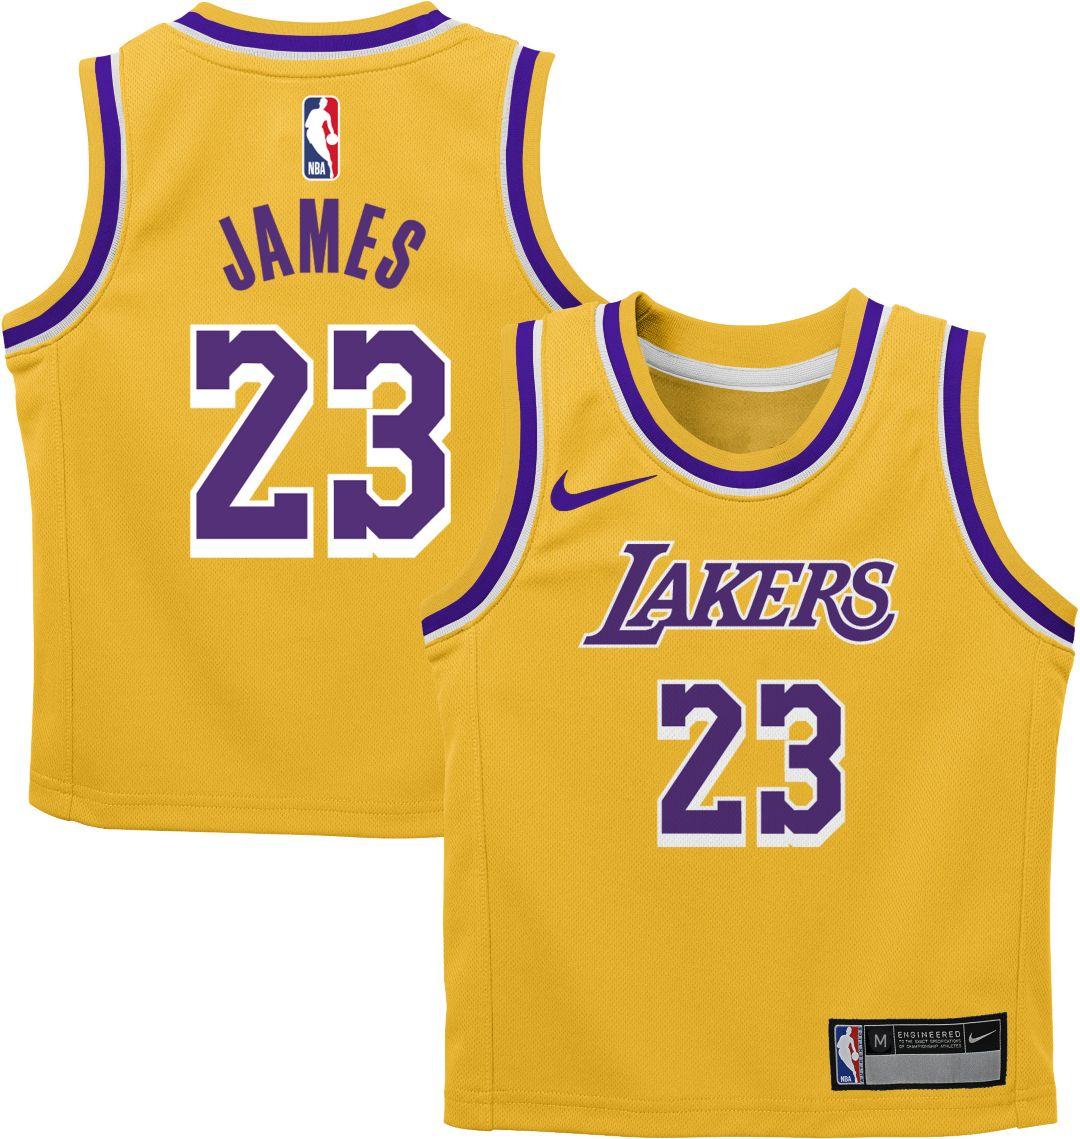 26e7b6c8f113 Nike Toddler Los Angeles Lakers LeBron James #23 Gold Dri-FIT Swingman  Jersey. noImageFound. Previous